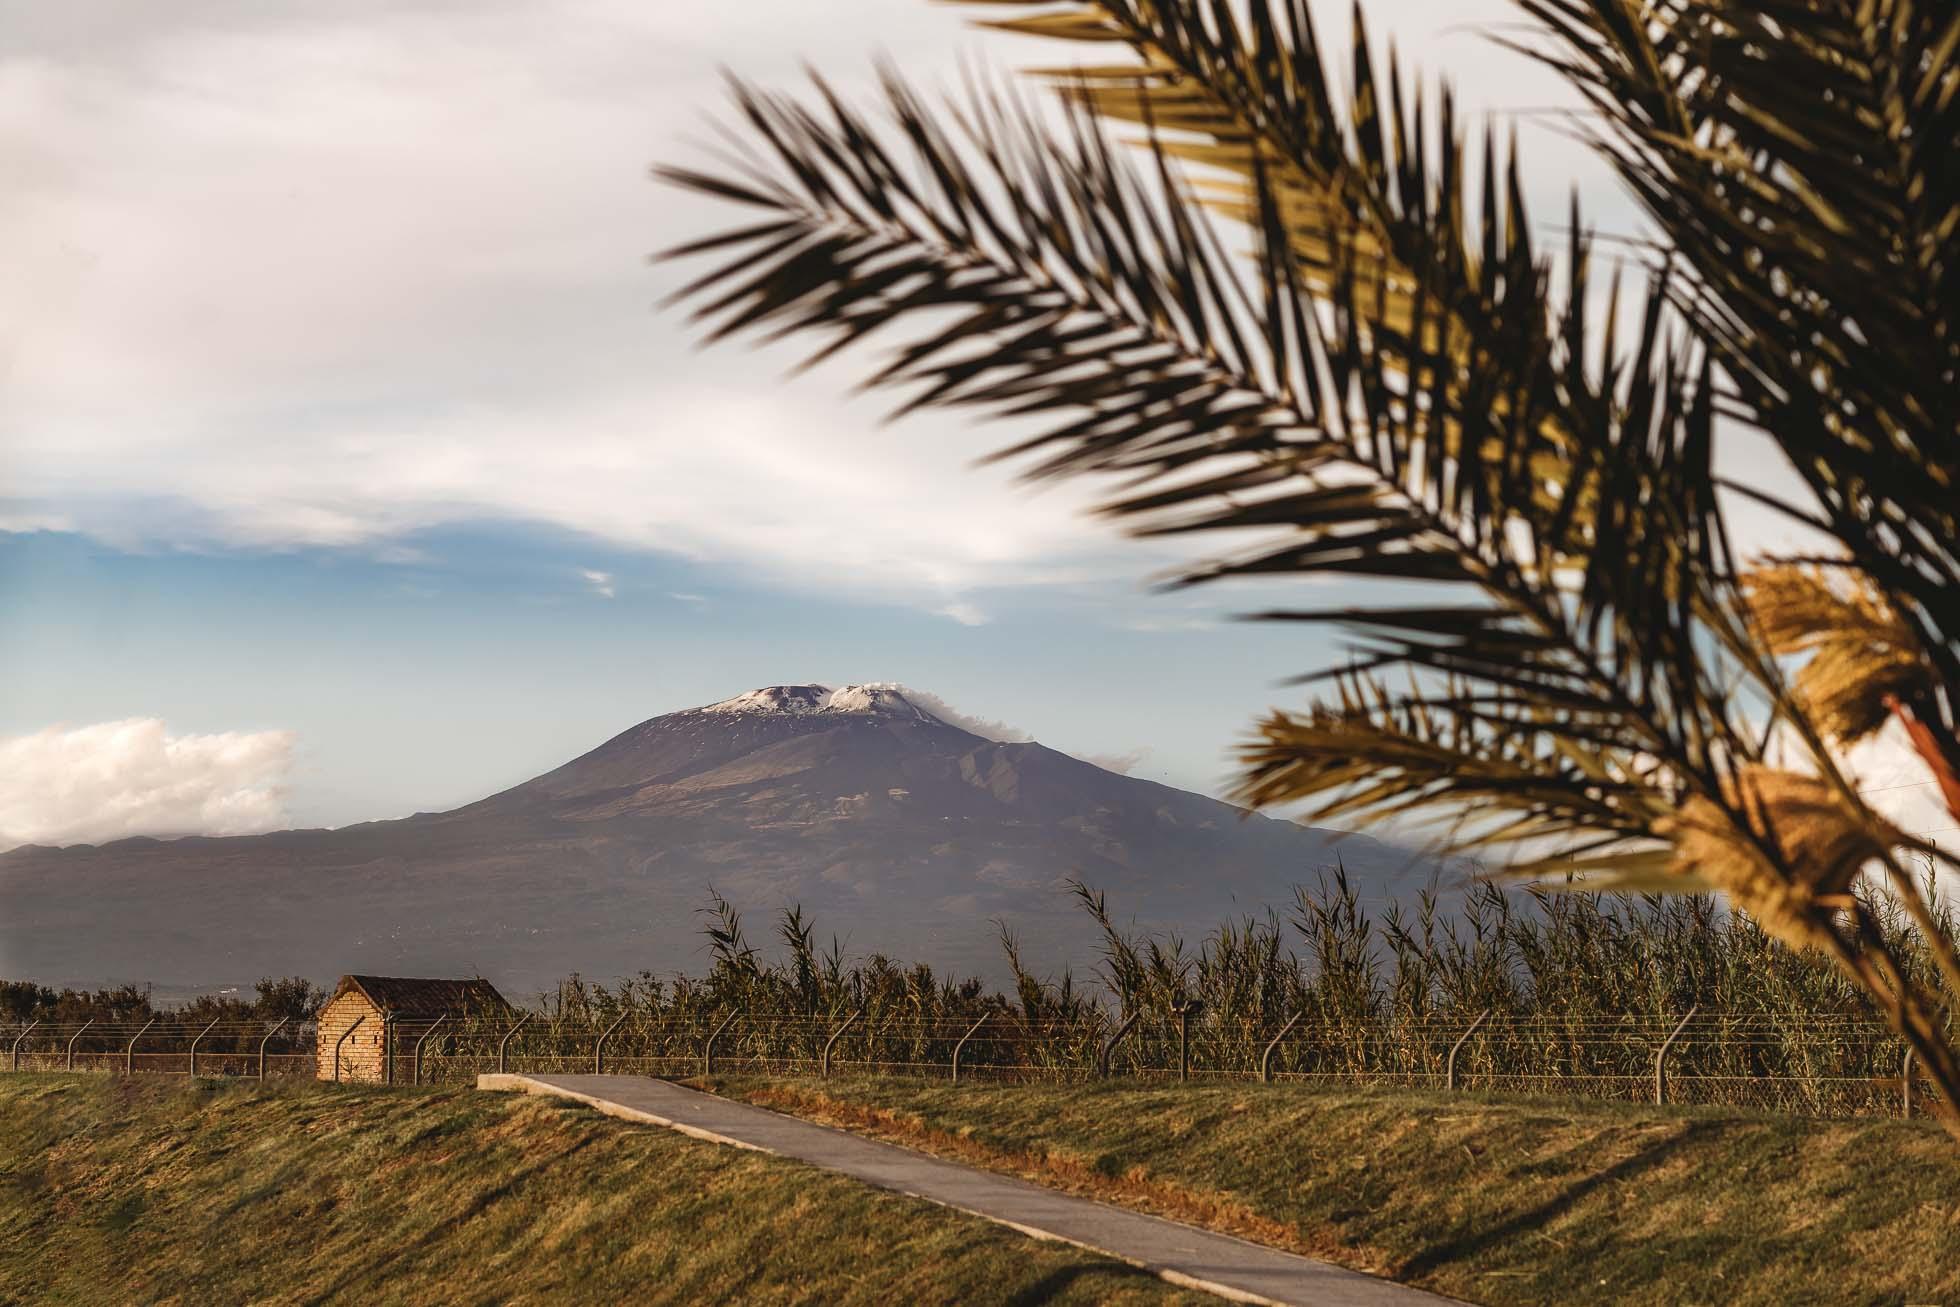 Mt Etna with snow during sicily italy coronavirus lockdown walk